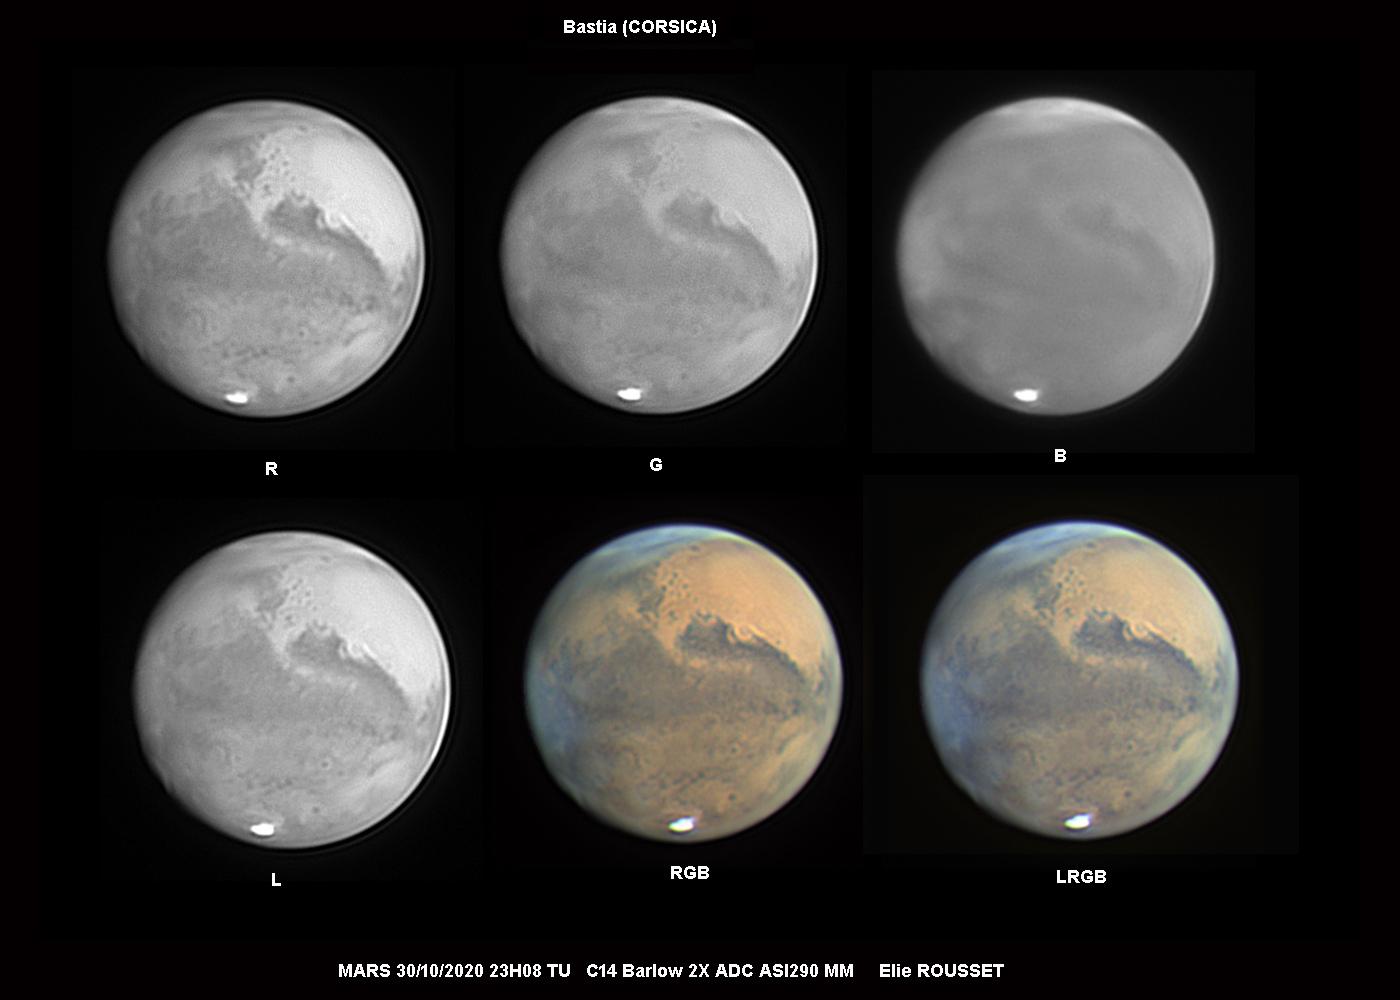 large.MARS_2020-10-30-2308_planch.jpg.003355564807ebba769b5529a5a557cb.jpg